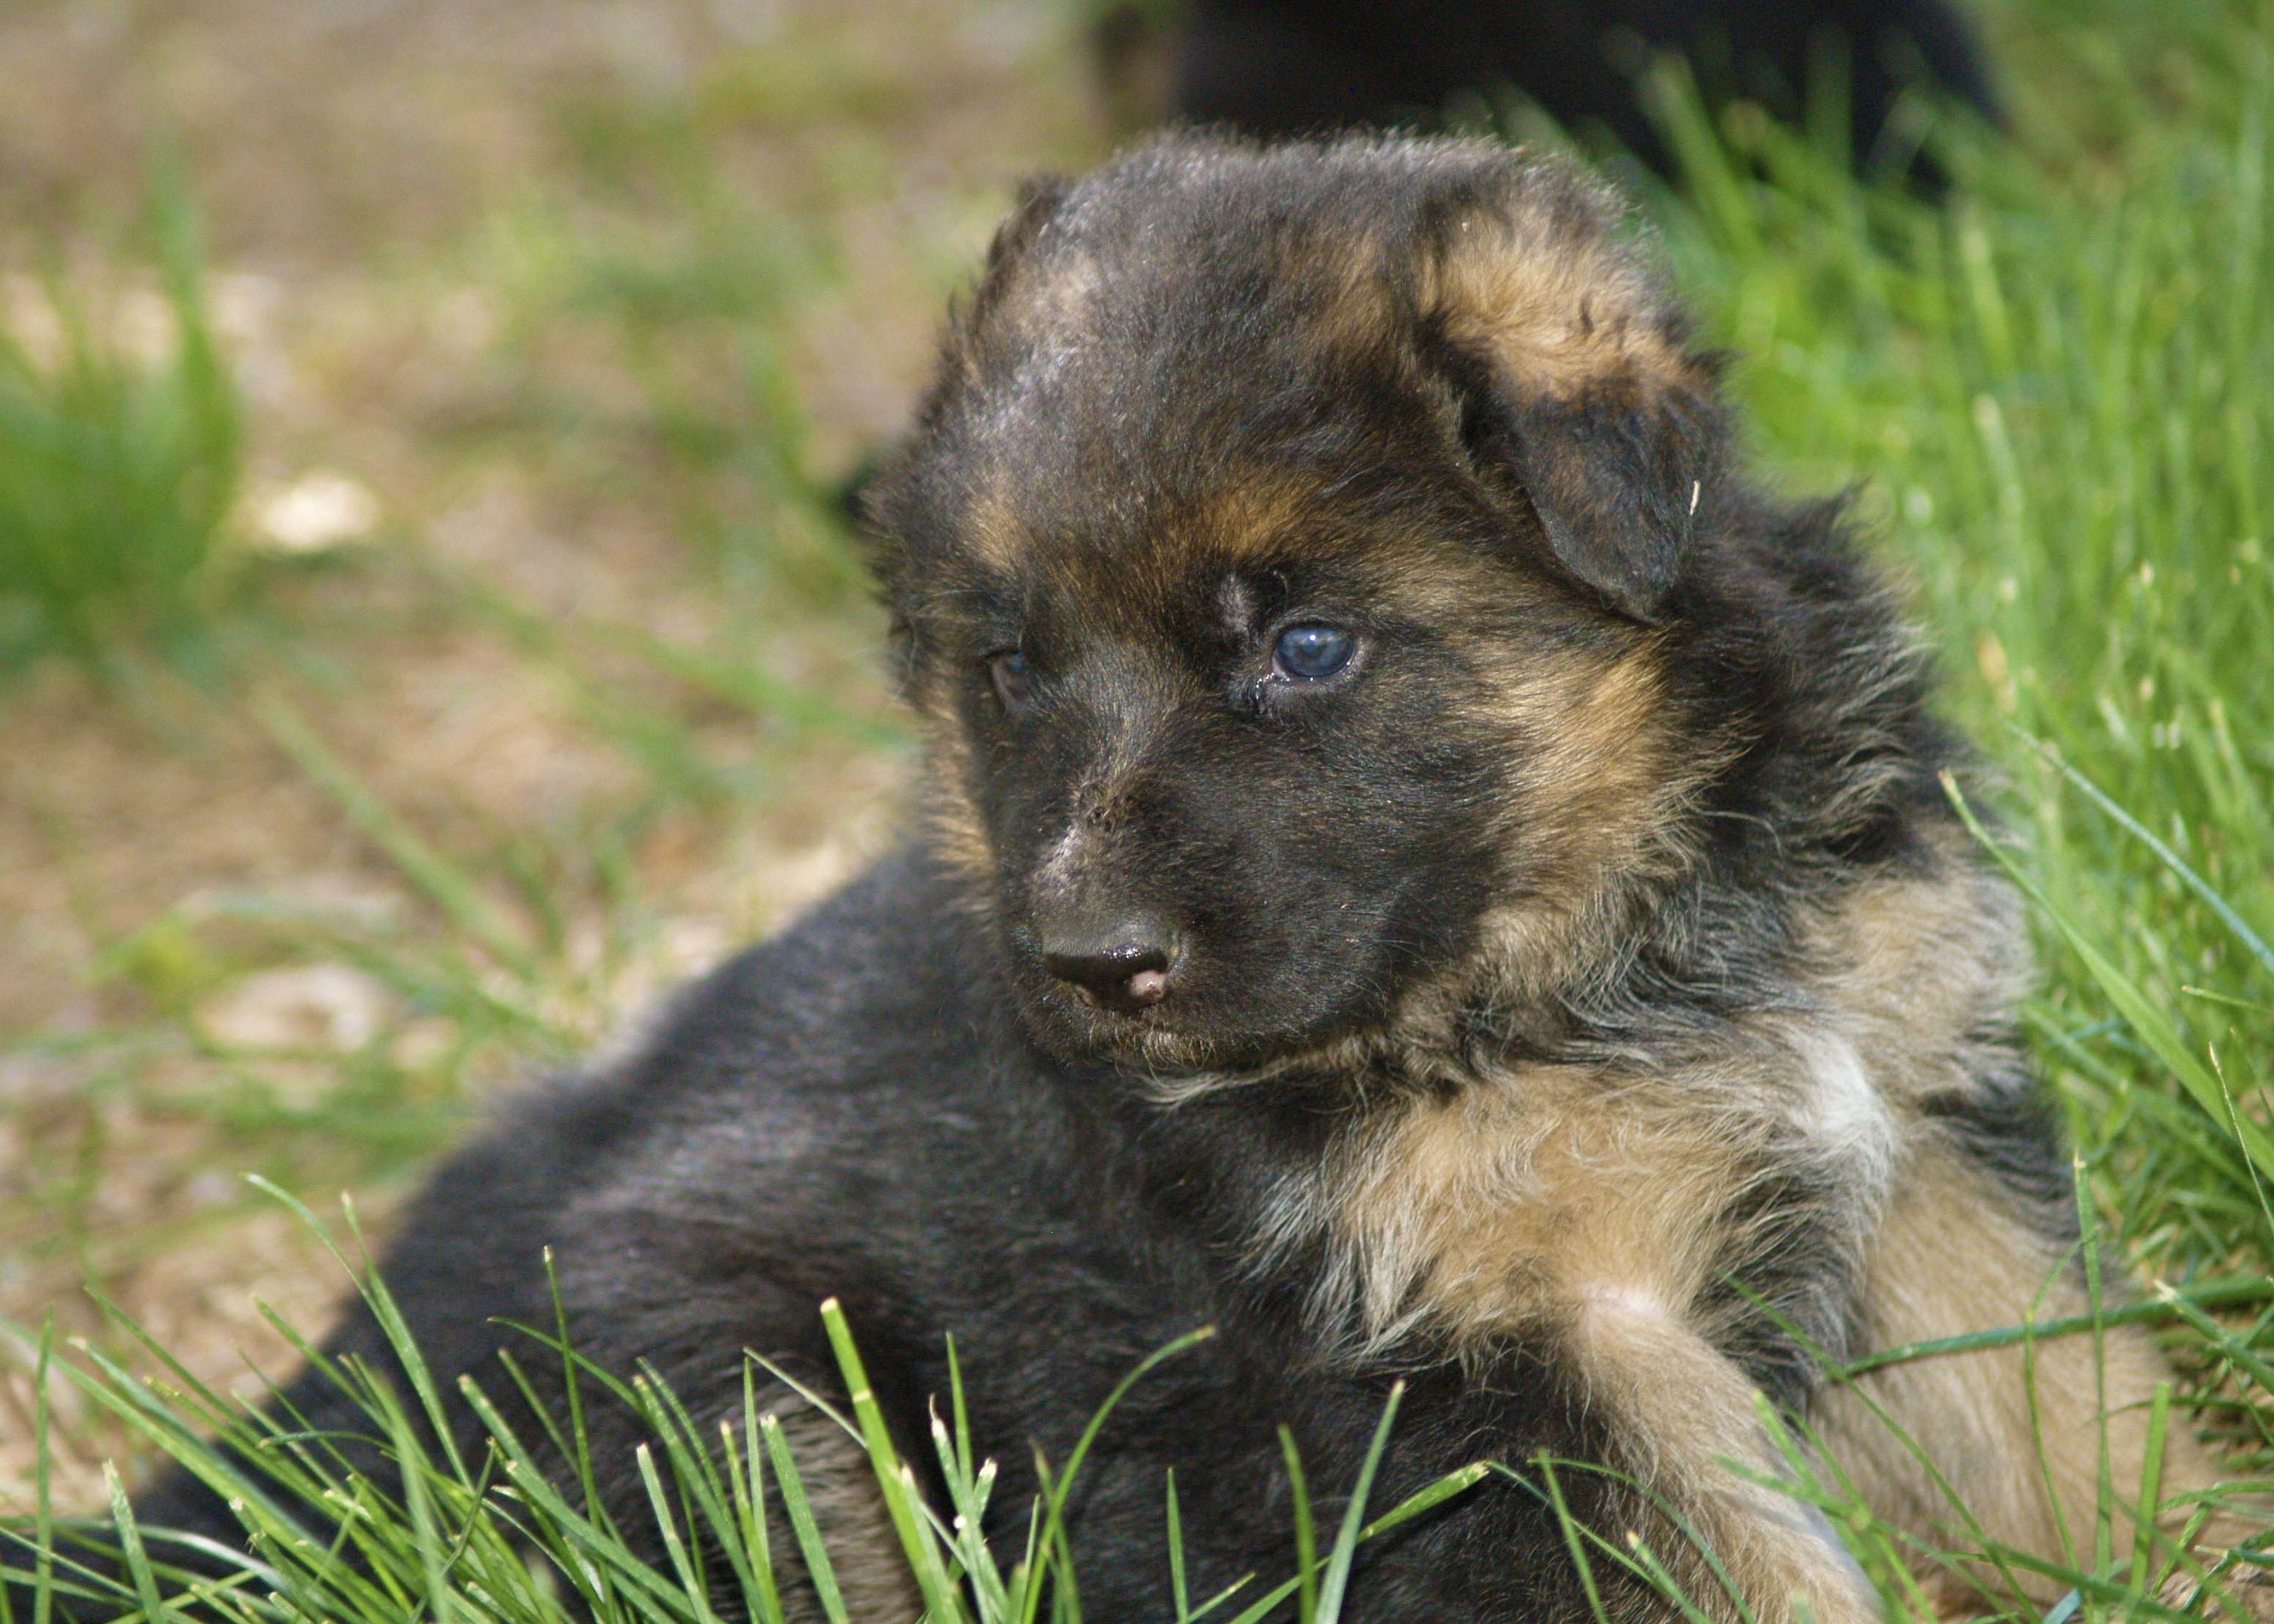 German Shepherd Puppy In 2020 German Shepherd Kennels German Shepherd German Shepherd Puppies